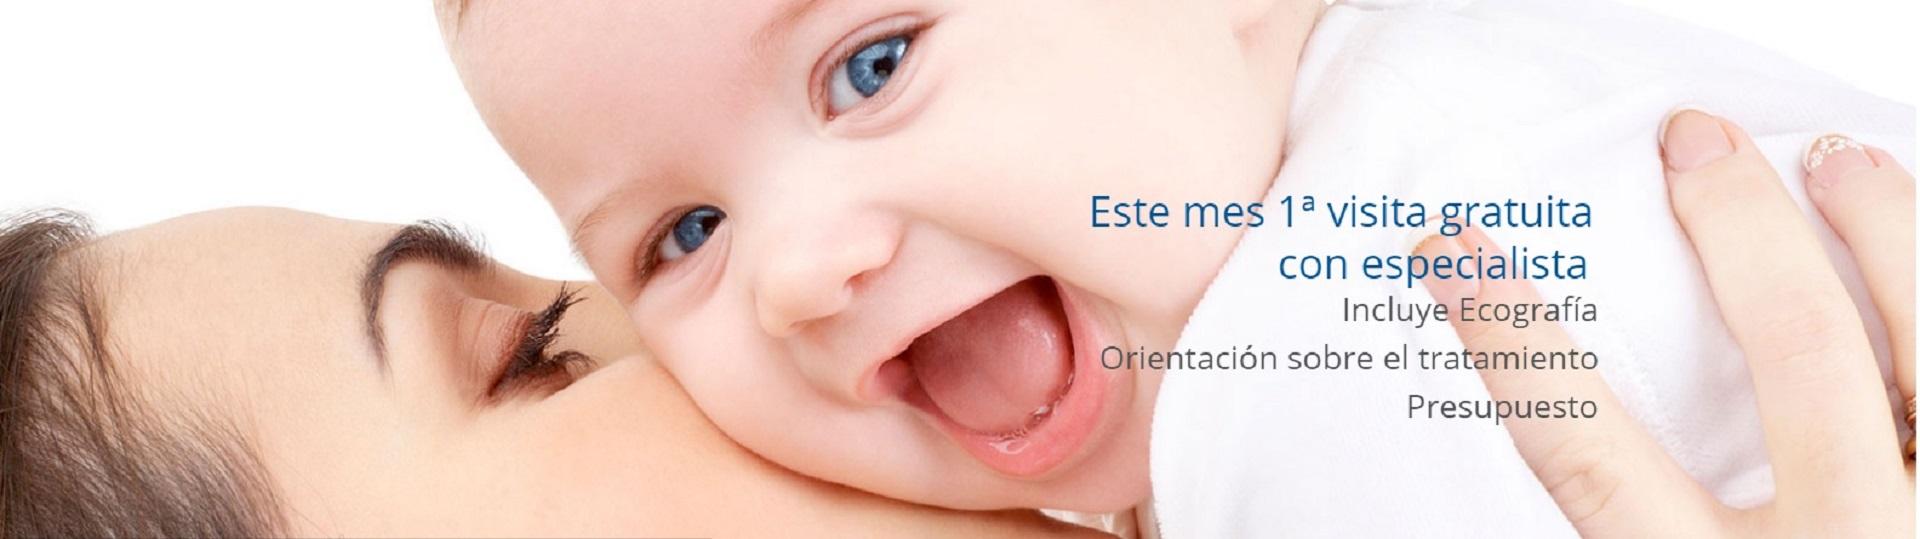 clinica de reproduccion asistida en Murcia imfer